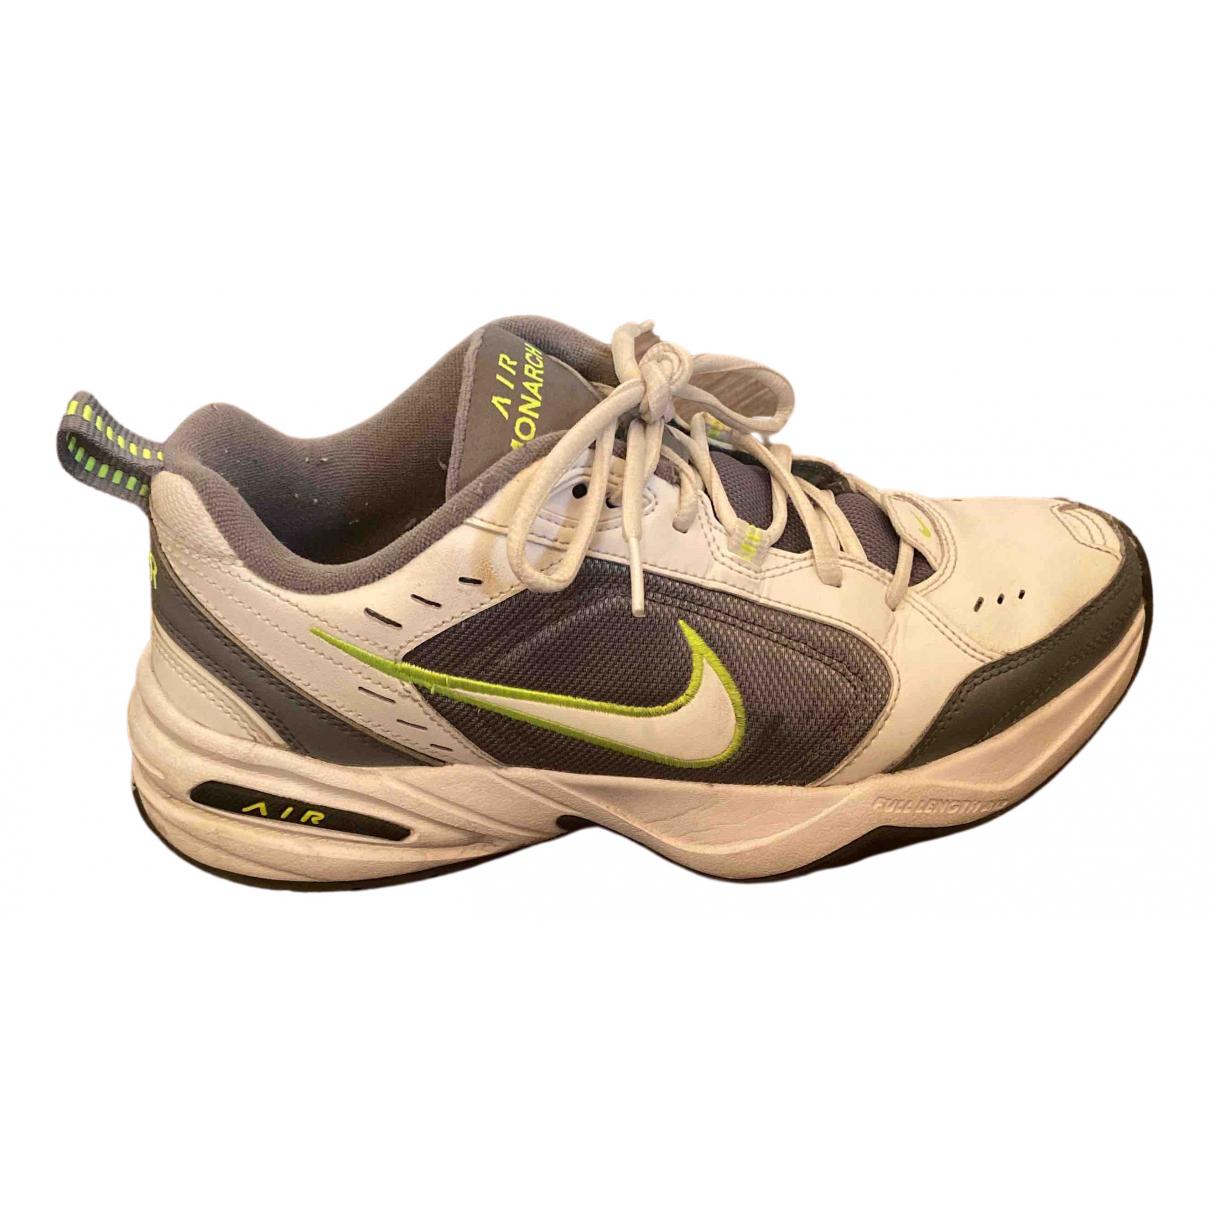 Nike - Baskets Air Monarch pour homme en cuir - blanc